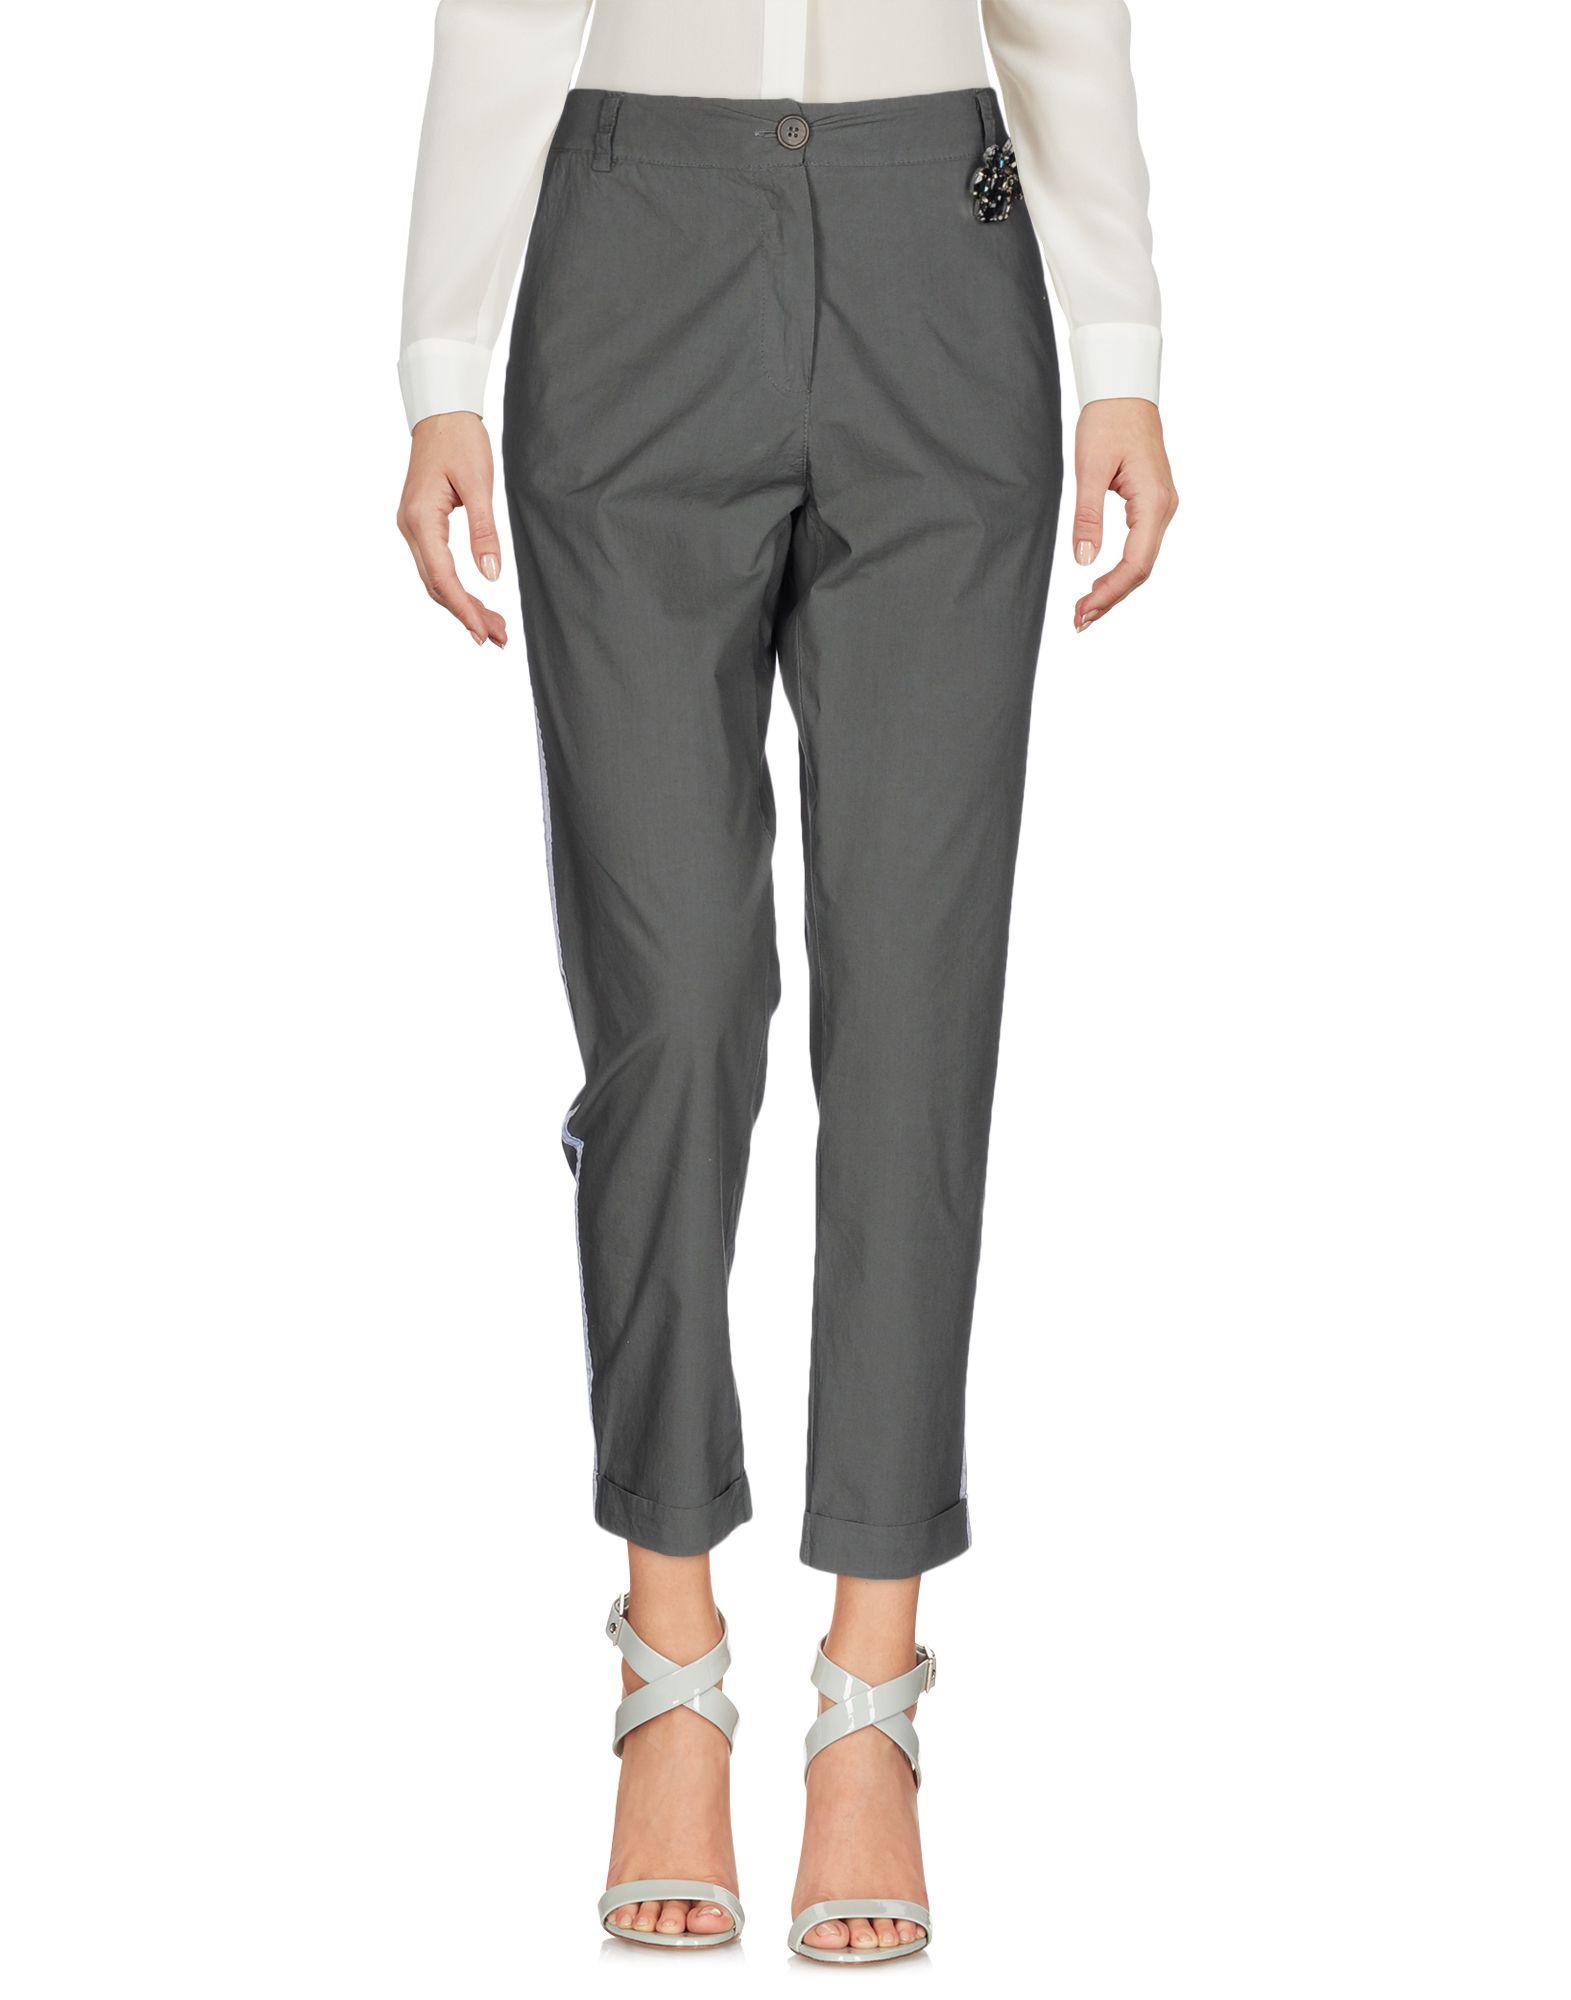 casual mujer en Yoox Jt Je T' Âlene en Lituania 'Â Pantalones Pantalón 36966902ca de línea qX8RAw